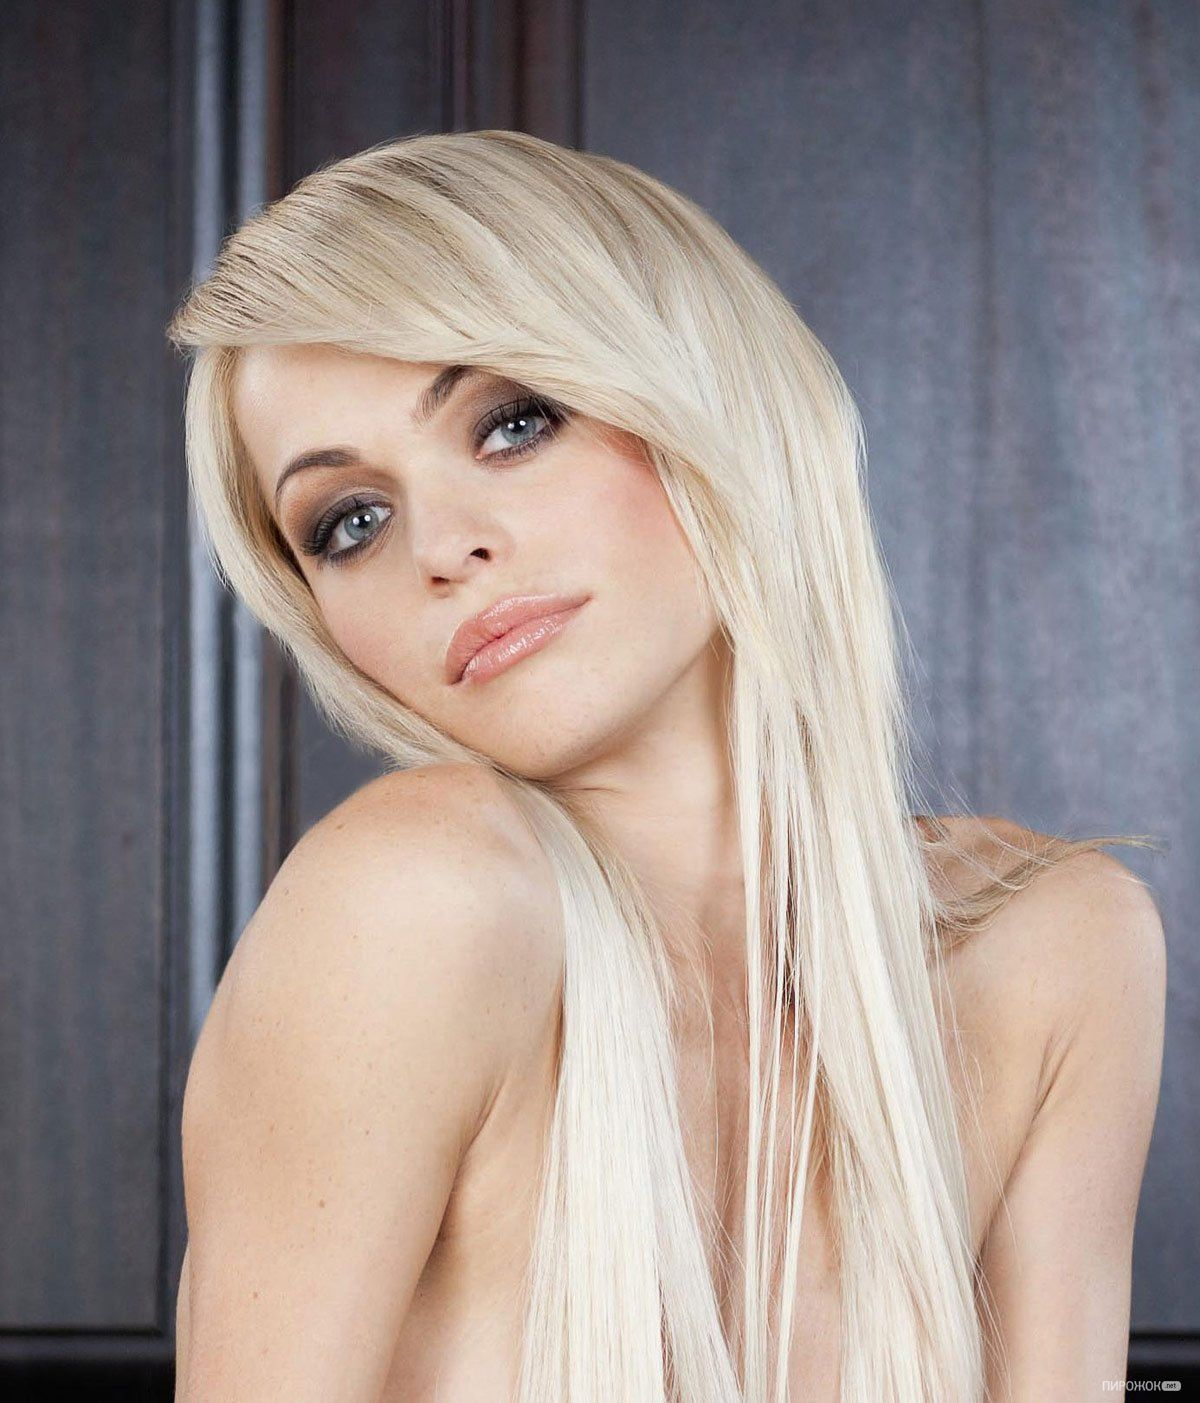 Anna khilkevich sexy - 2019 year